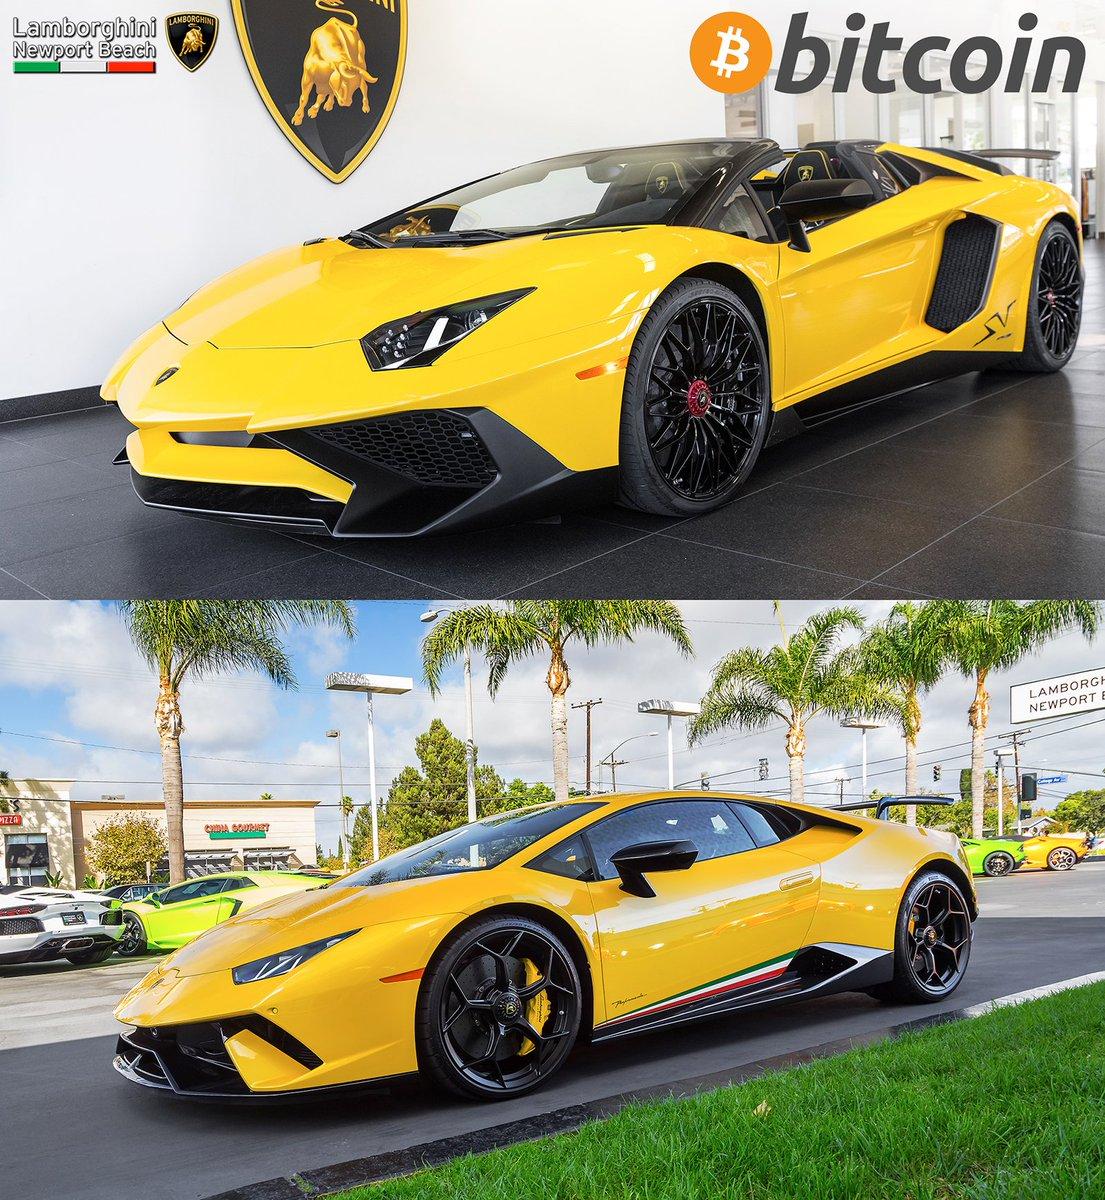 Lamborghininewportbeach Hashtag On Twitter